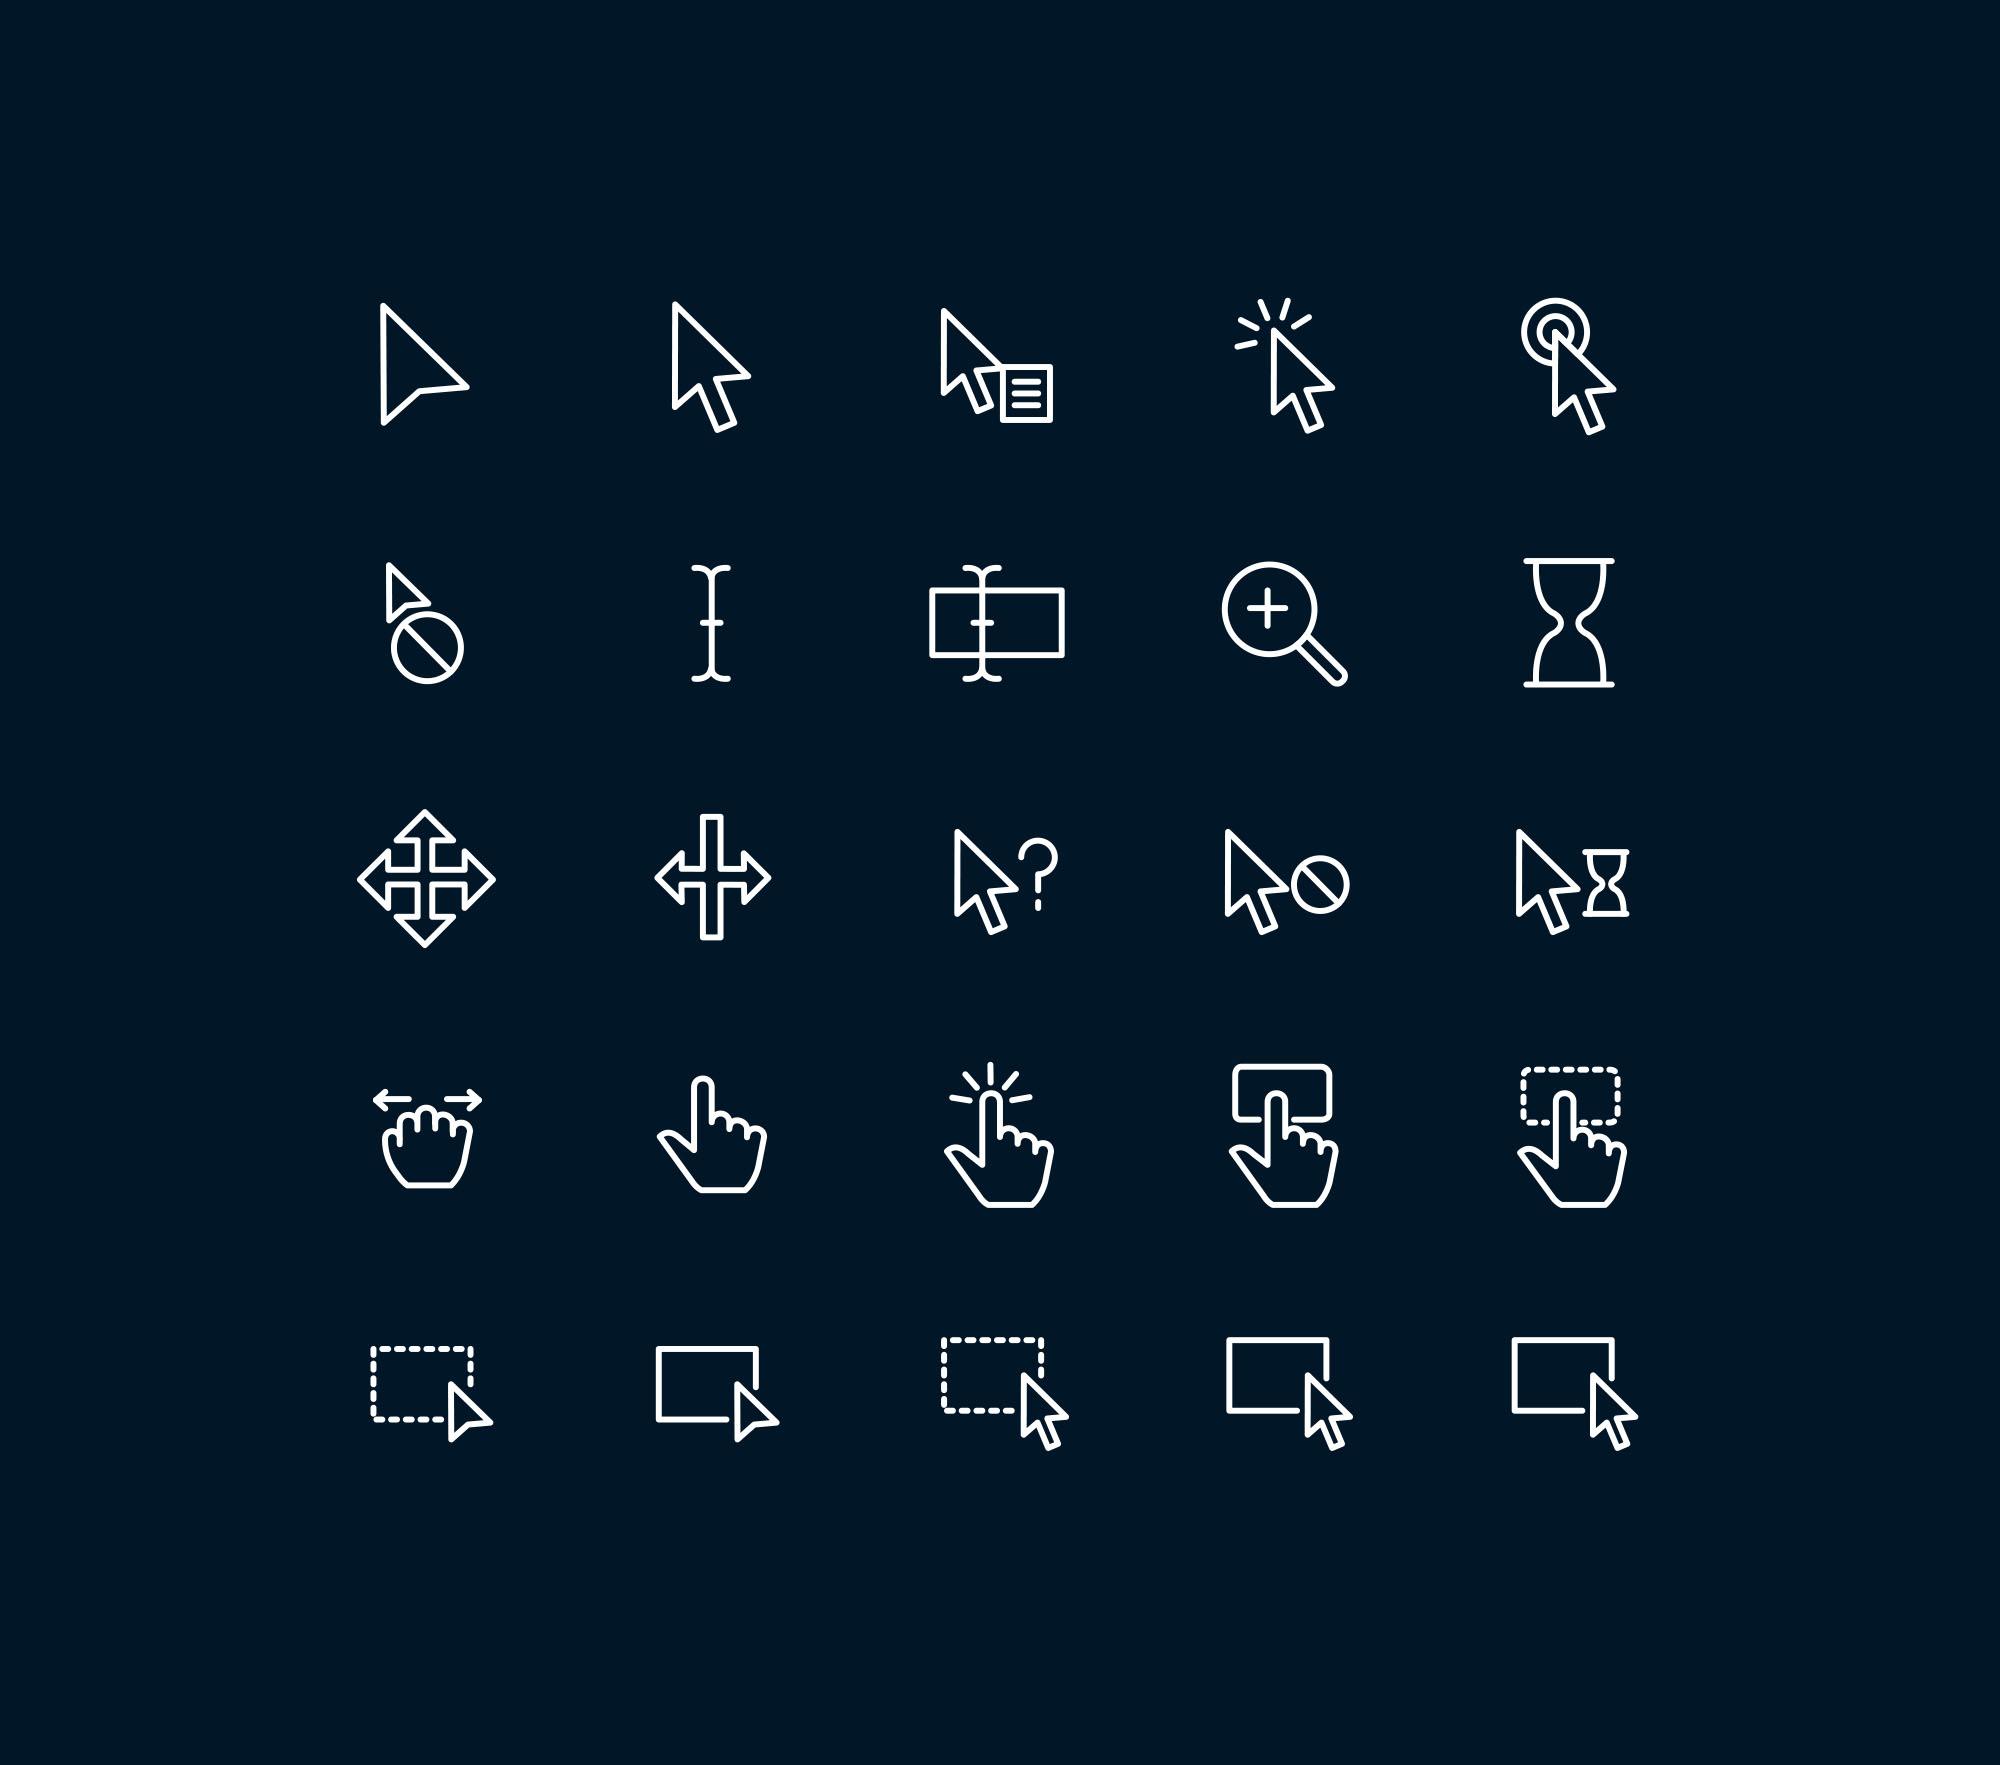 Cursor & Selection Icons - Dark